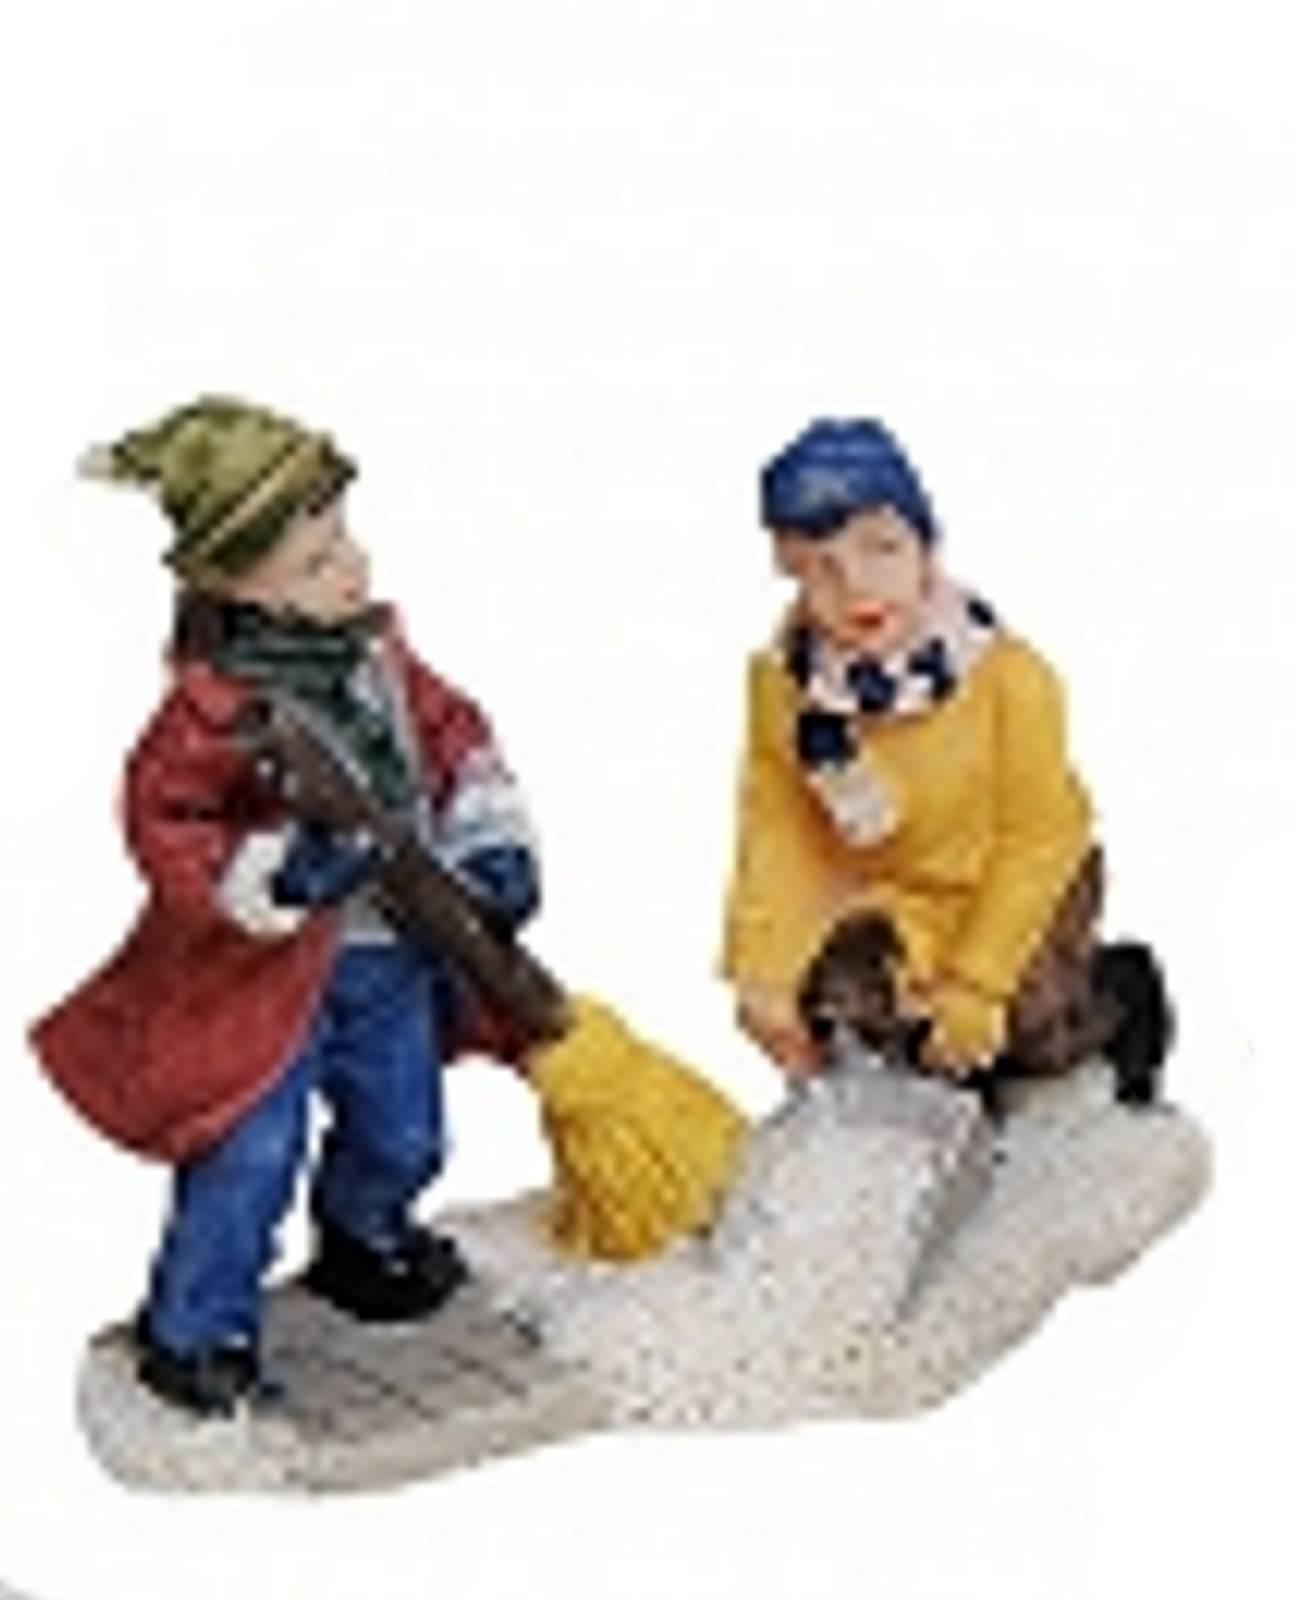 Lichthaus Wurm Accessories Christmas Miniature Winter Scene Person